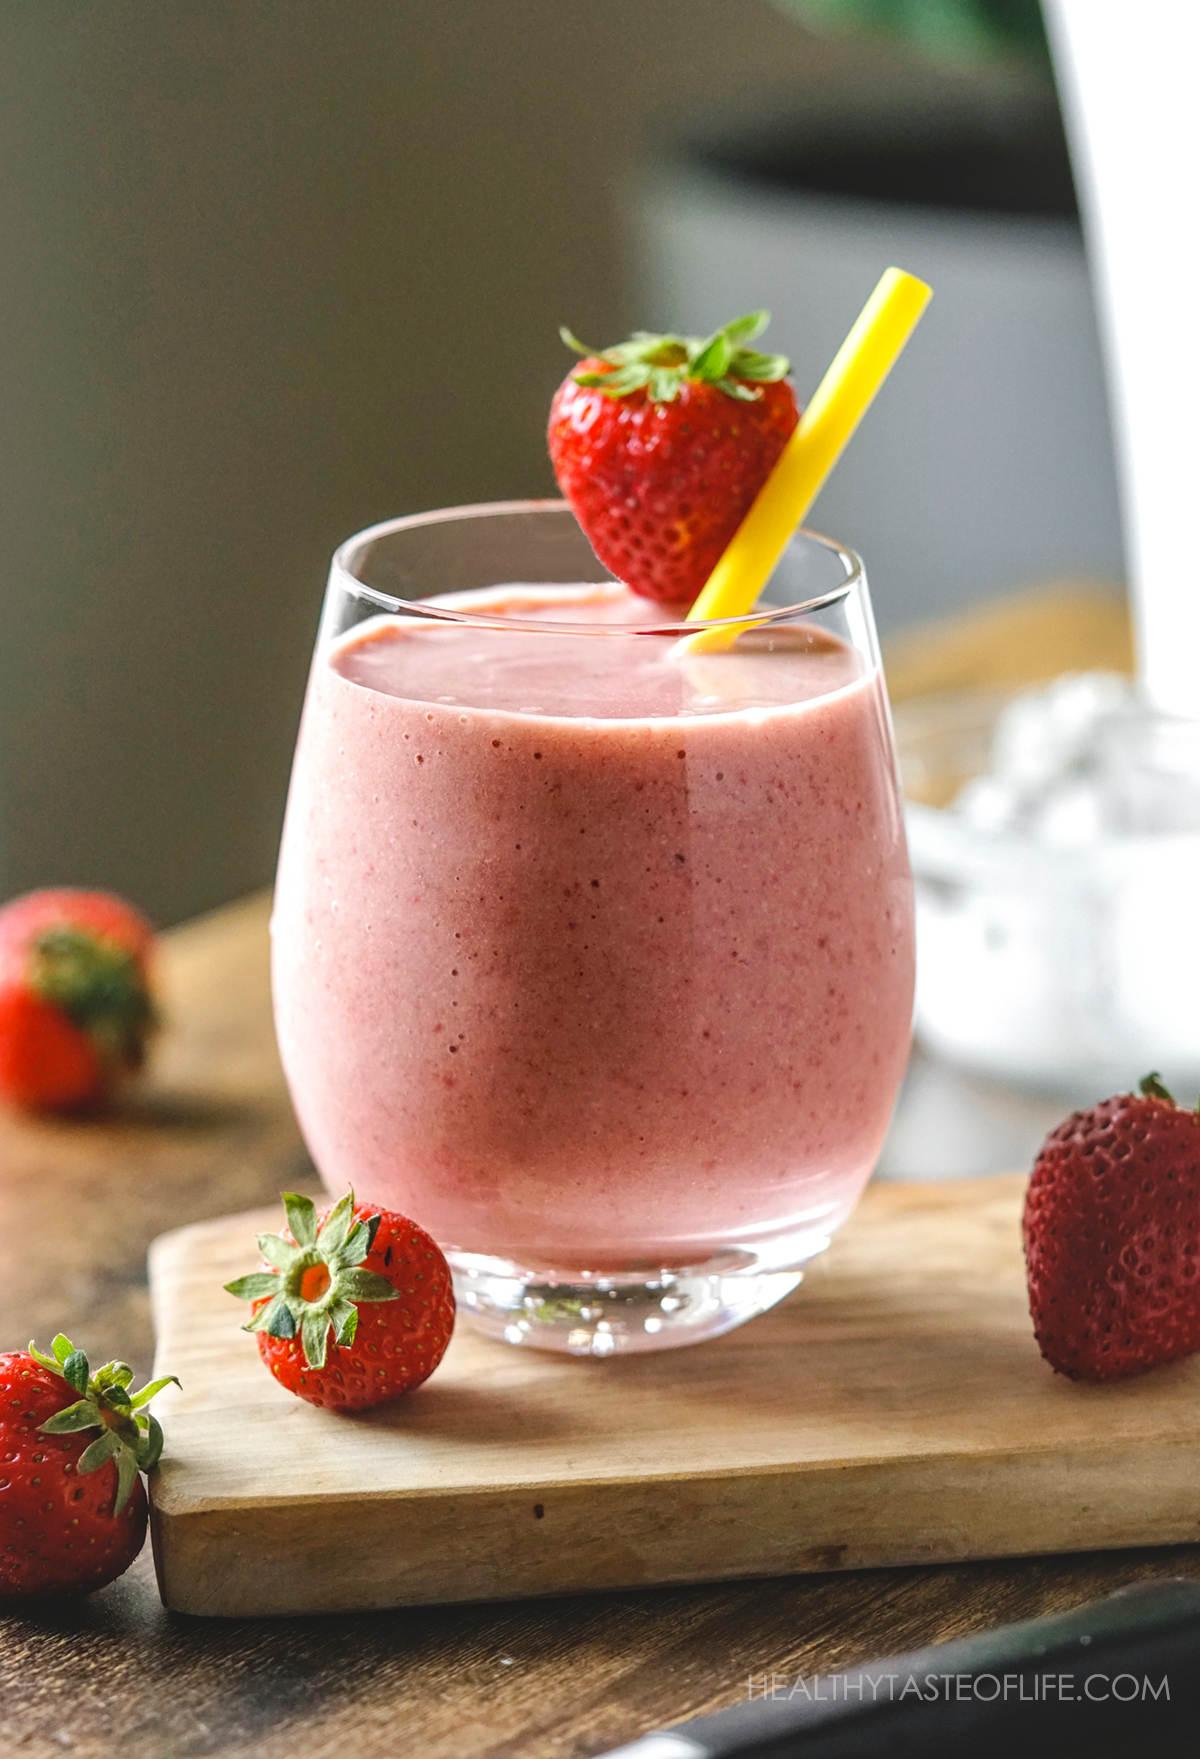 Strawberry banana milkshake dairy free vegan in glass and garnished with a strawberry.